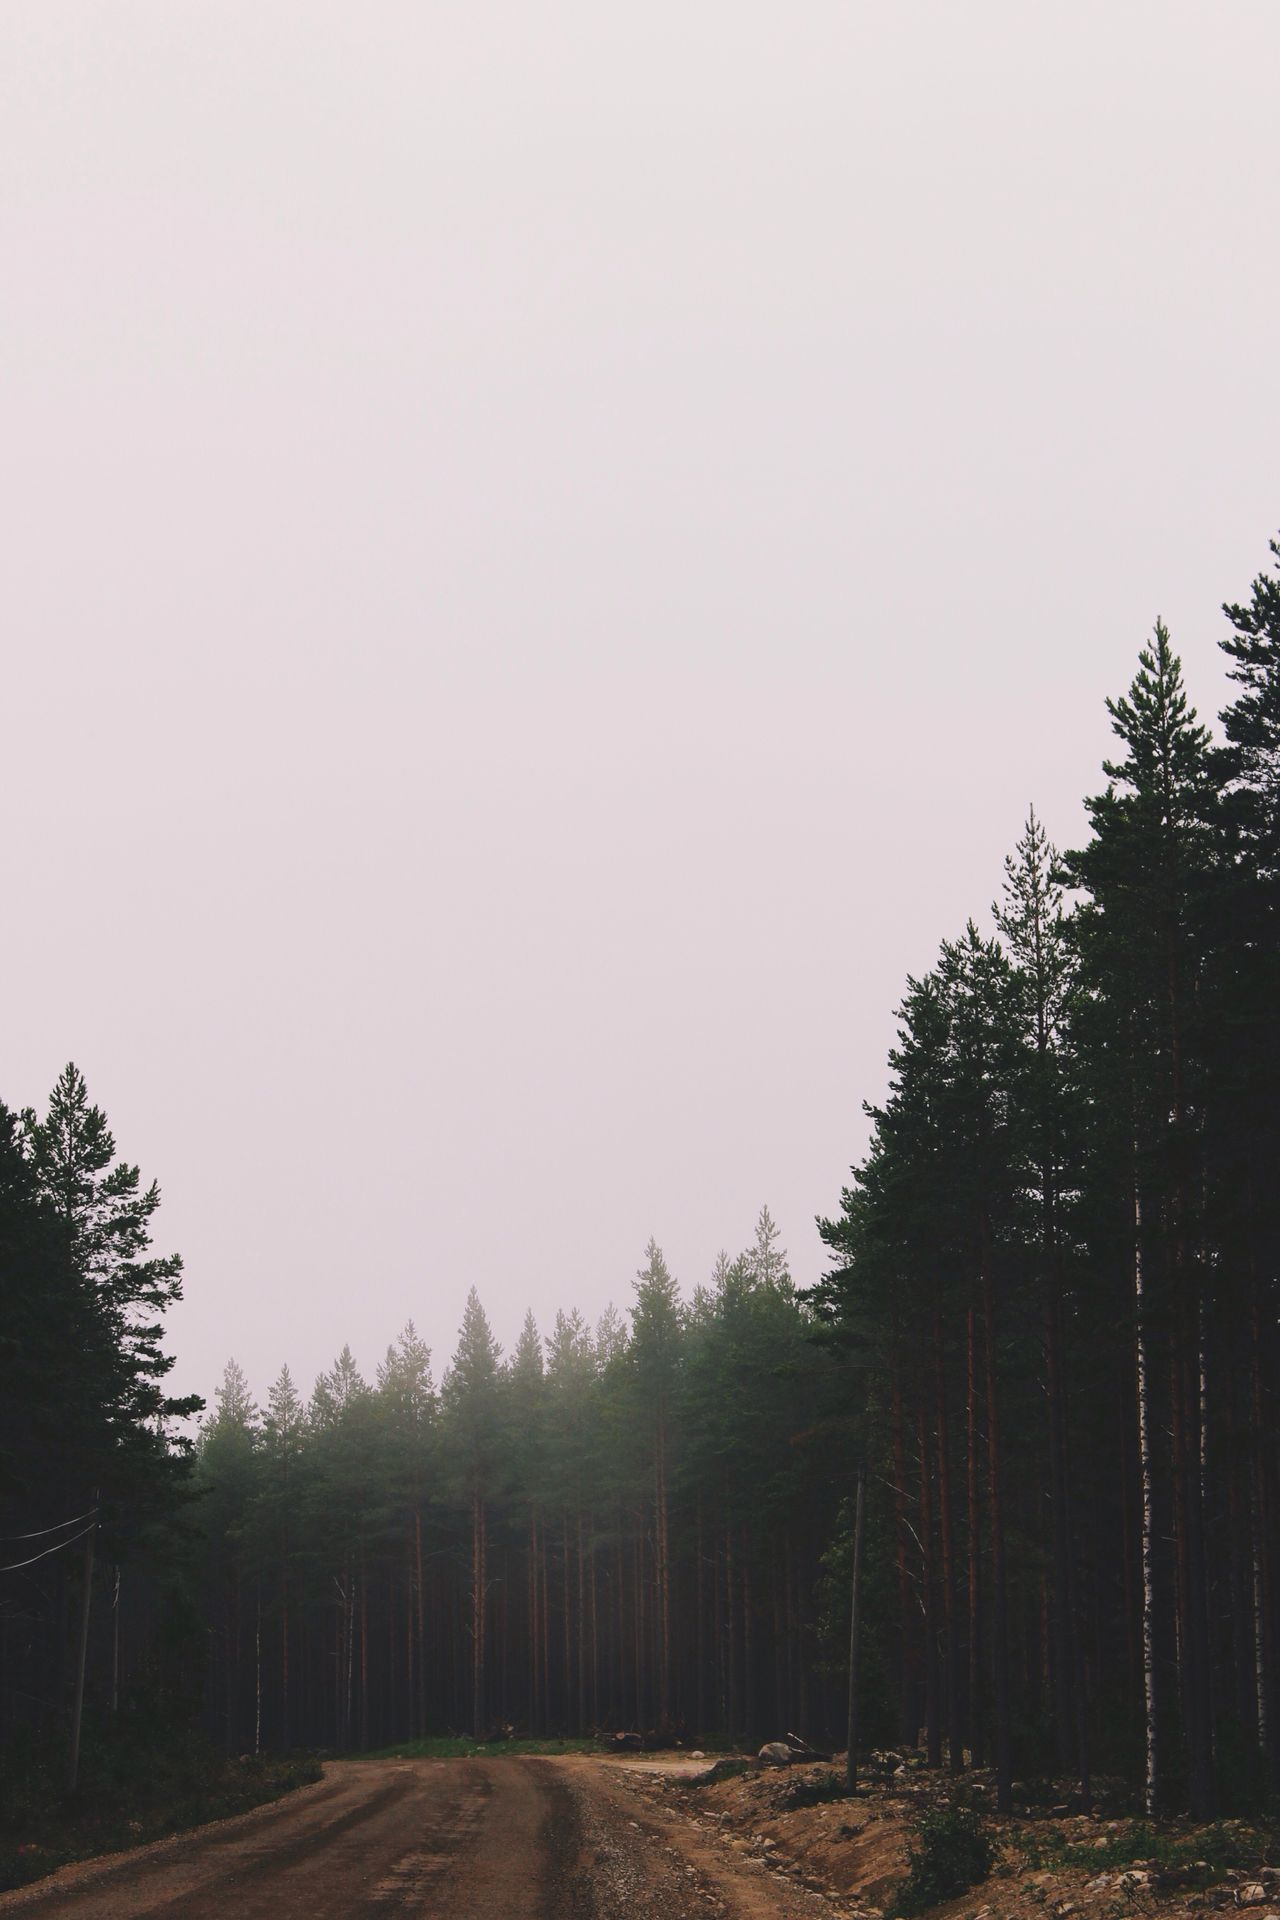 Summer Forest Trees Mist Misty Pine TheWeekOnEyeEM Desolate Hidden Gems